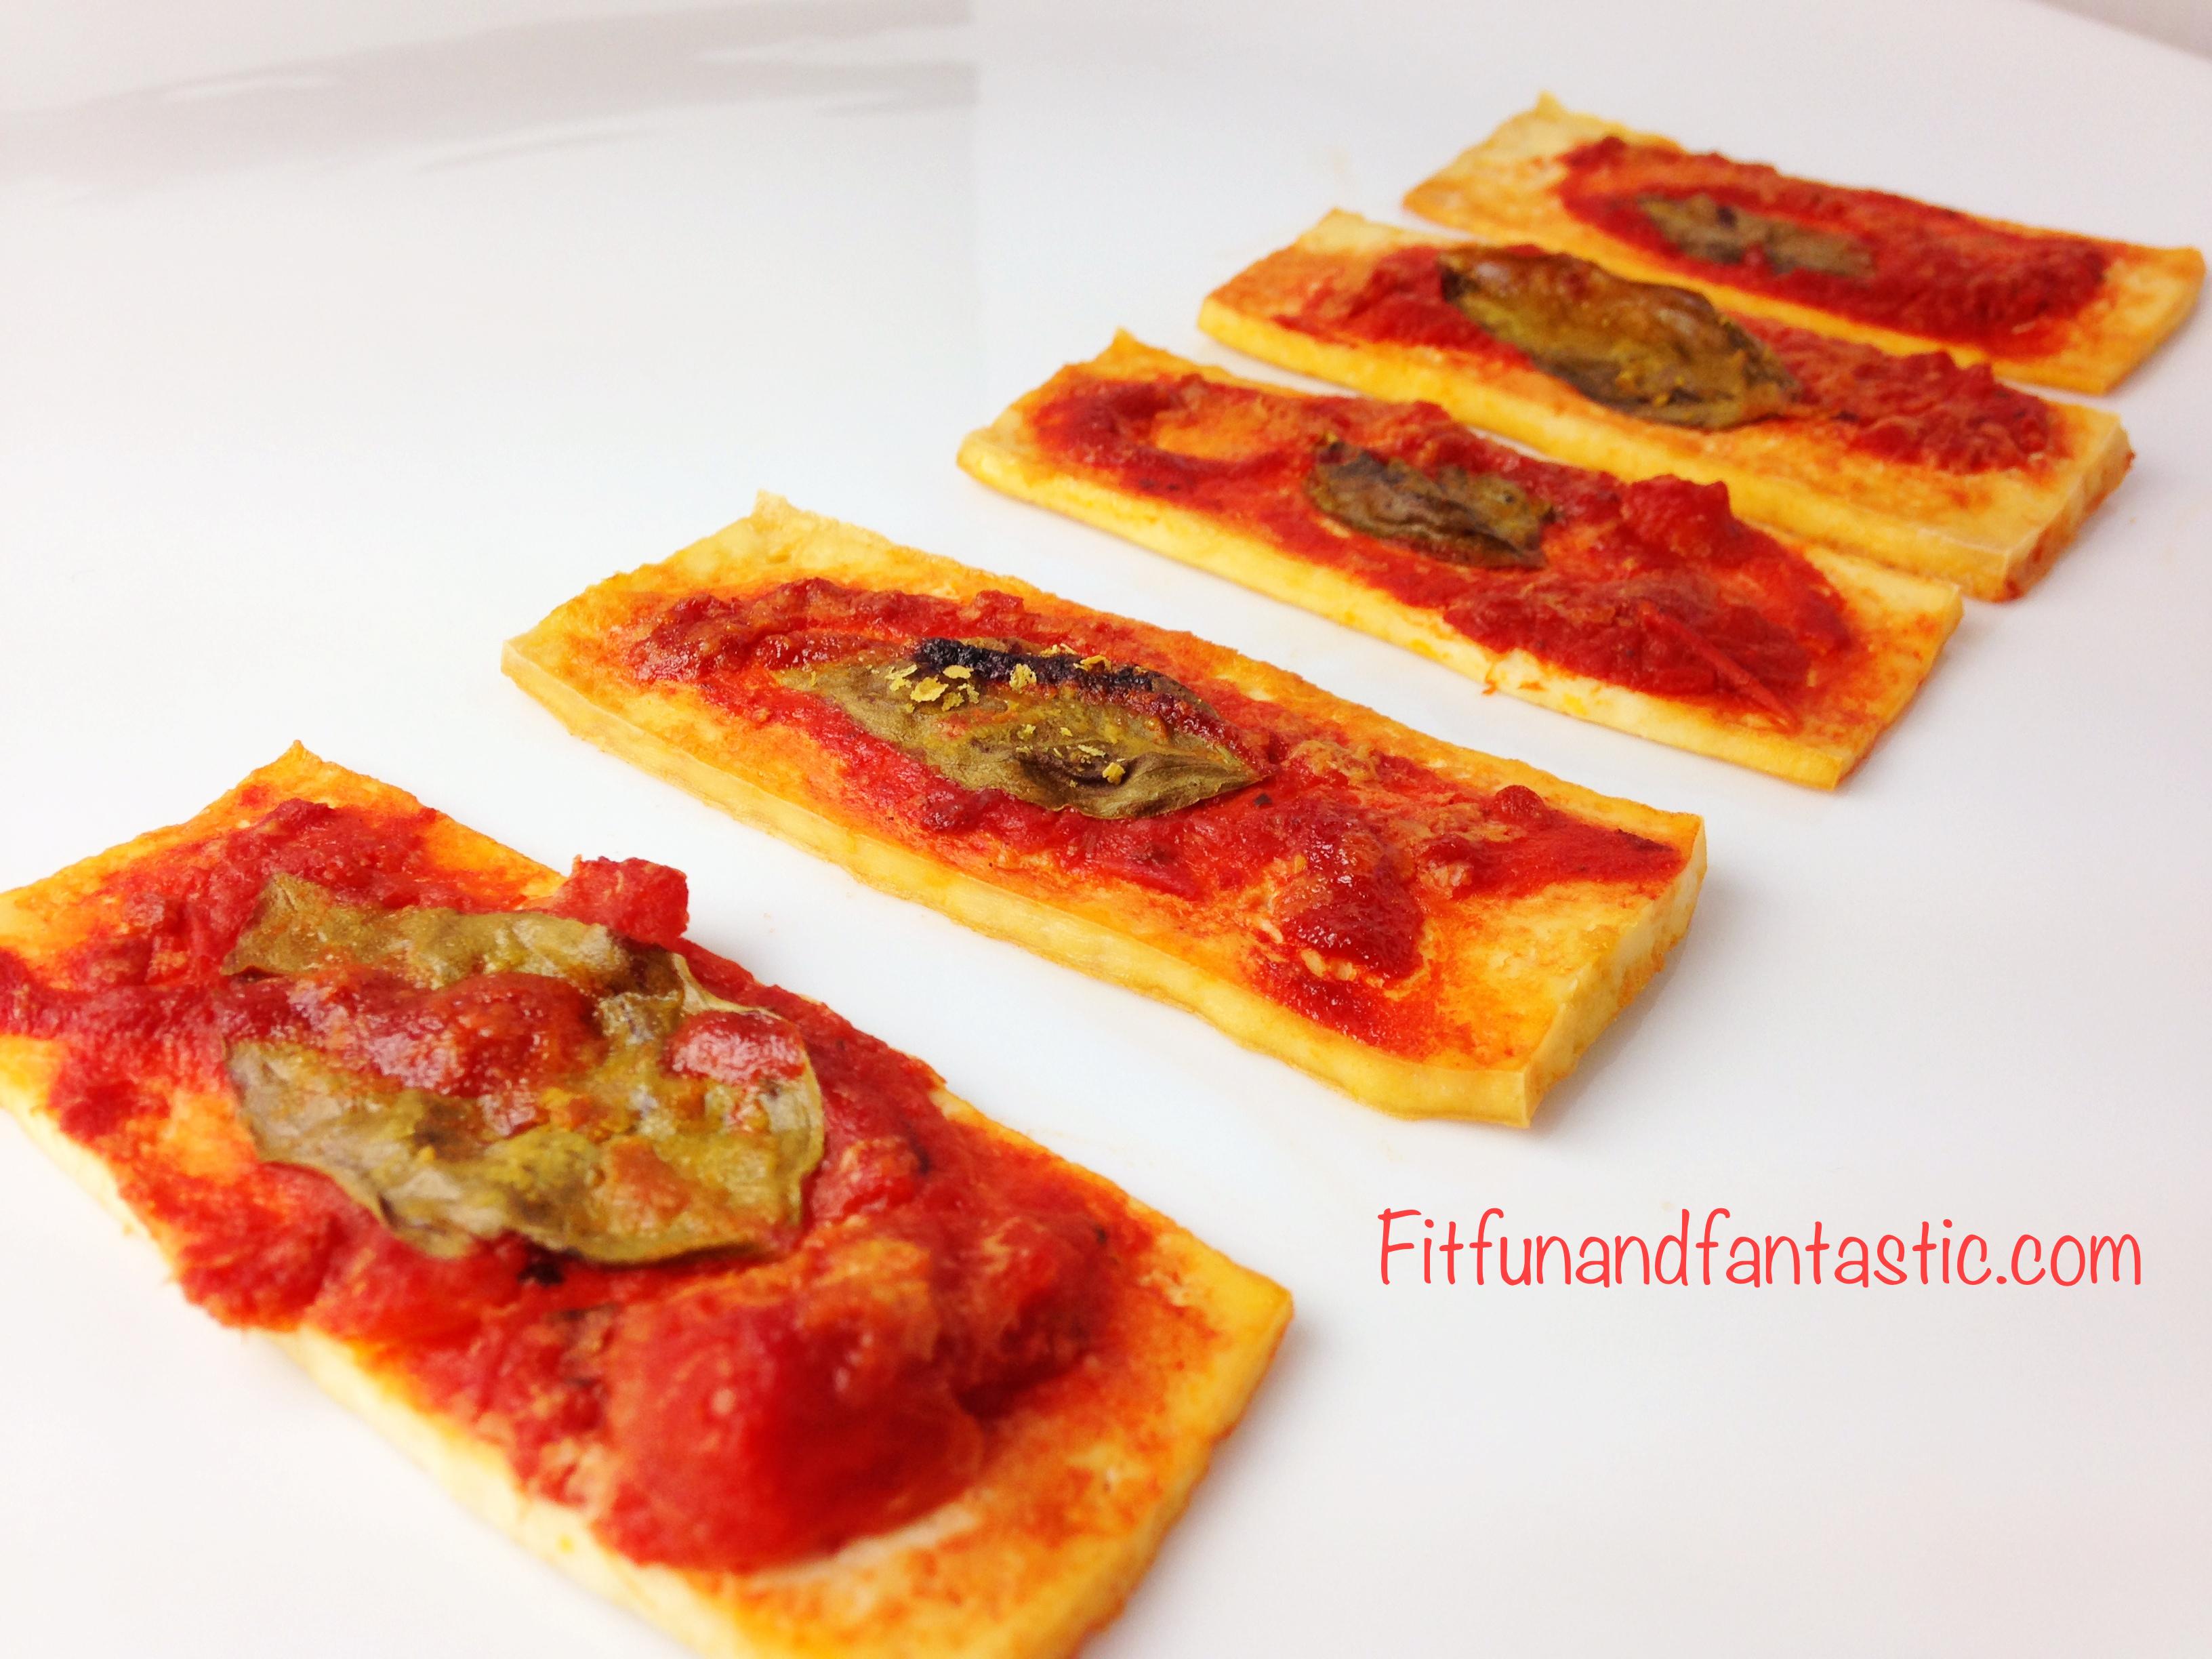 Tomato Basil Tofu Pizza | Fantastically Fit